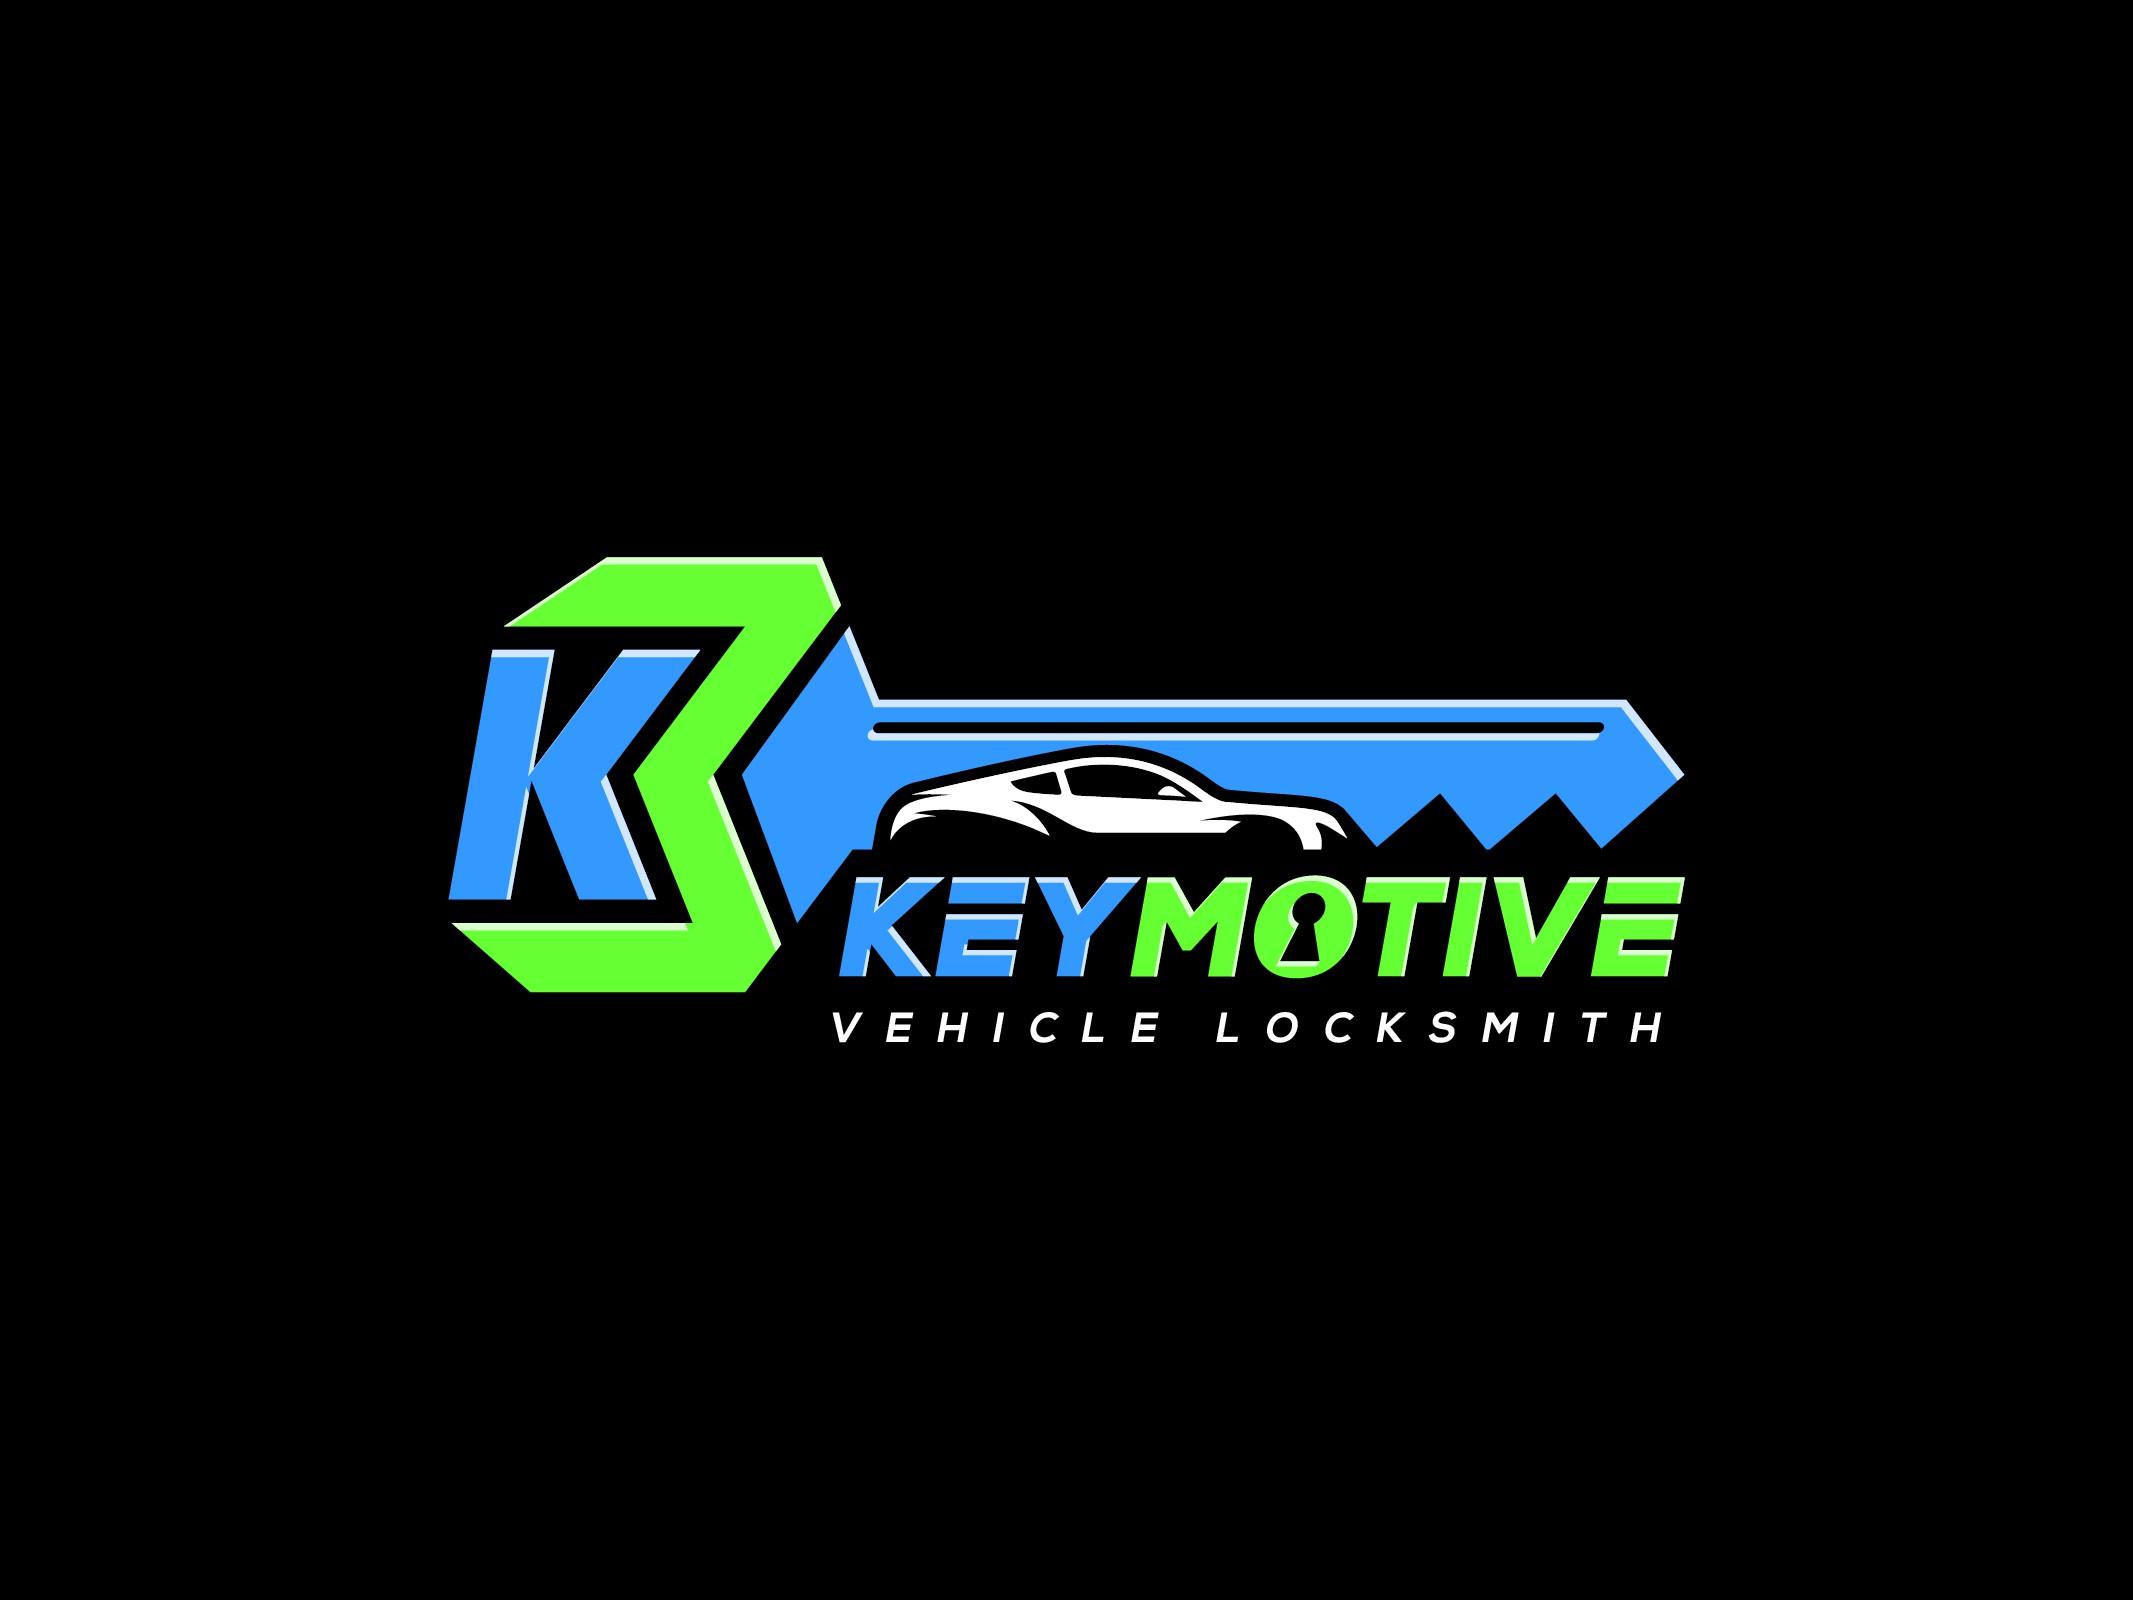 Design a BOLD modern logo for mobile locksmith, KeyMotive